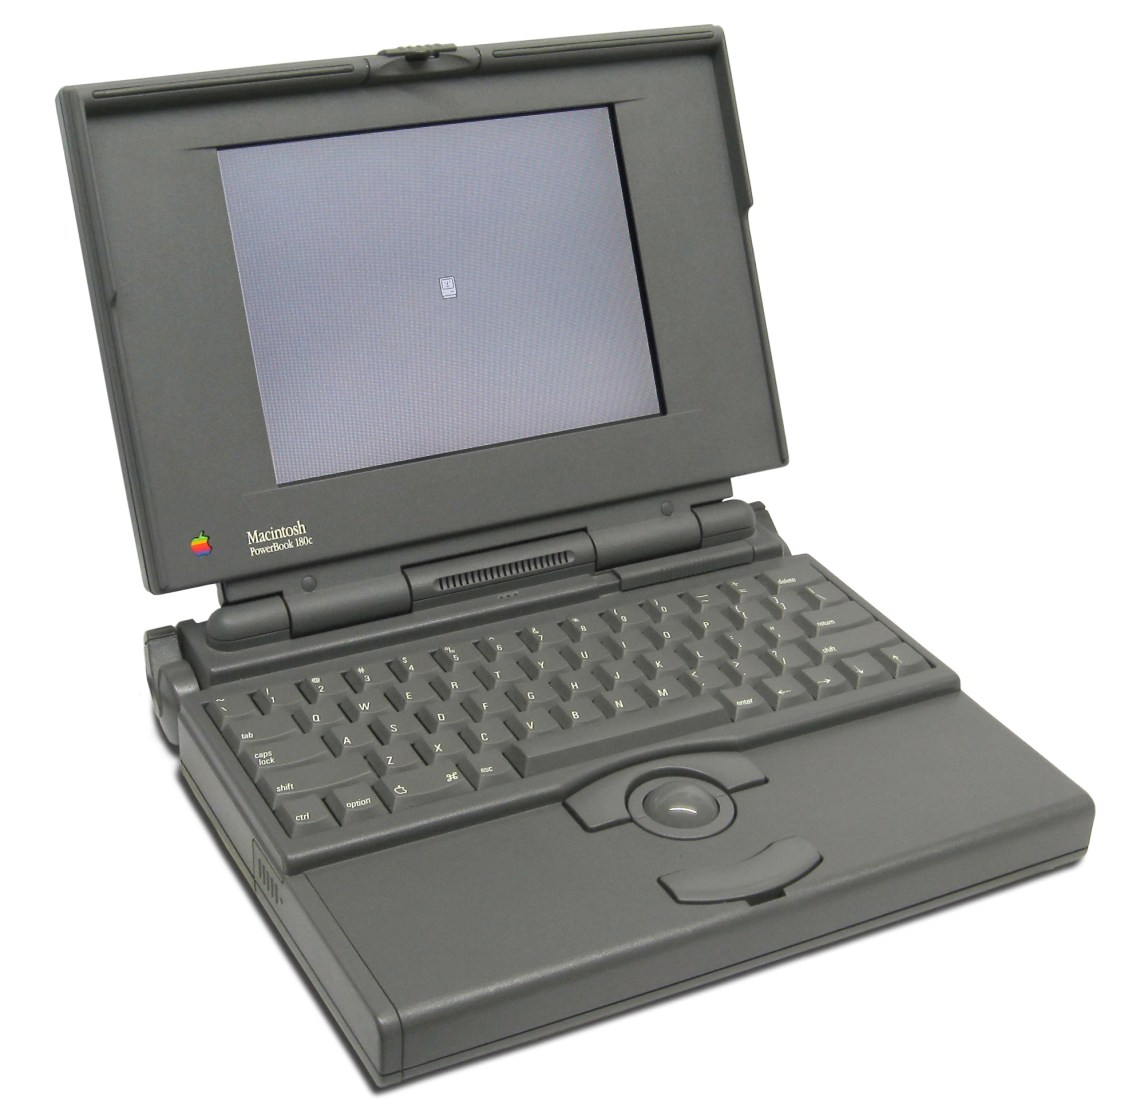 Image Result For Laptop Apple Wiki